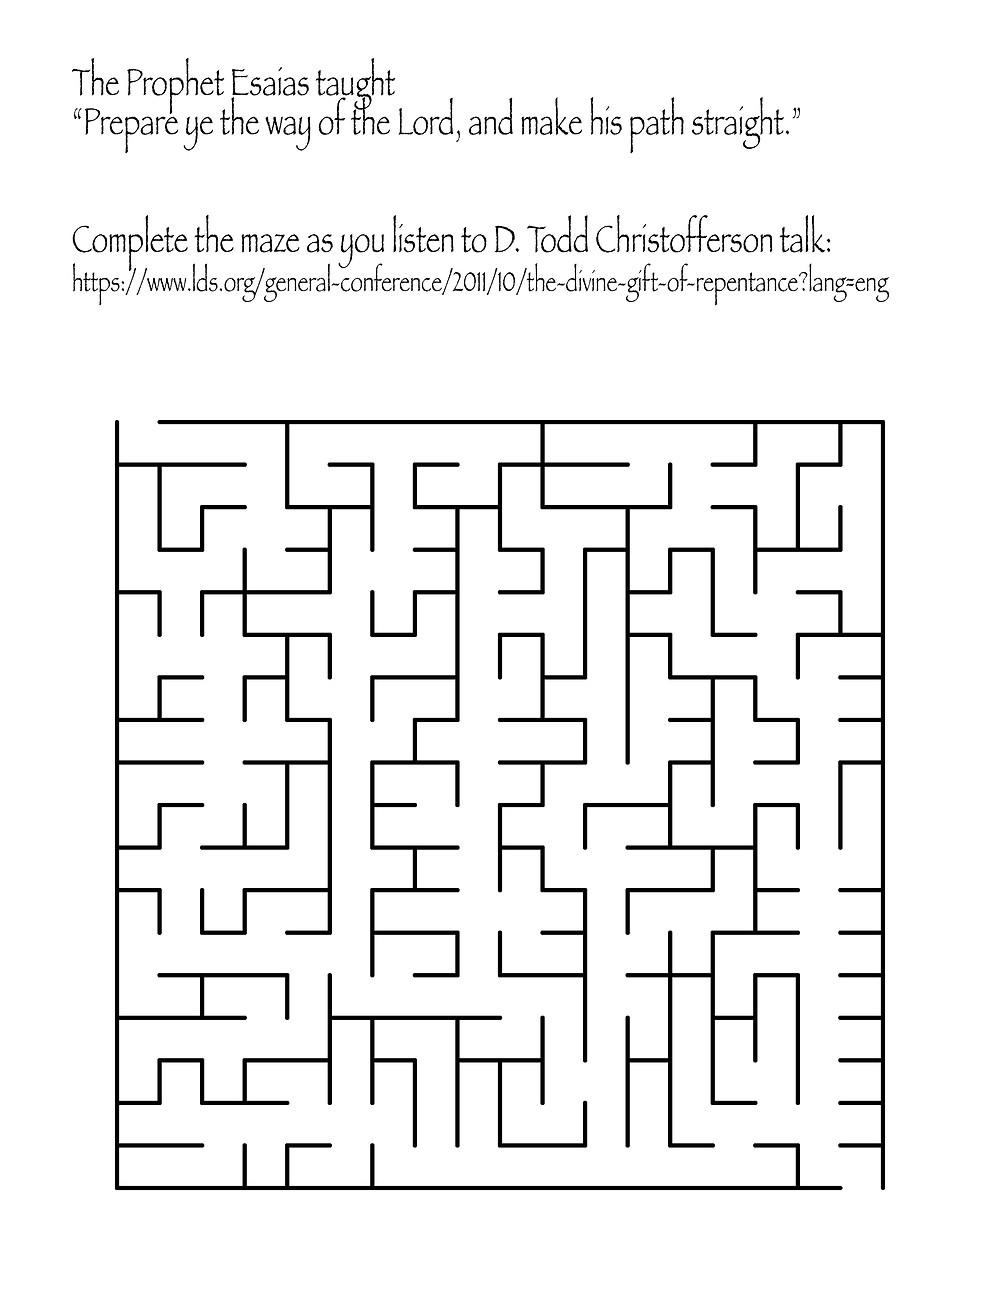 Repentance maze